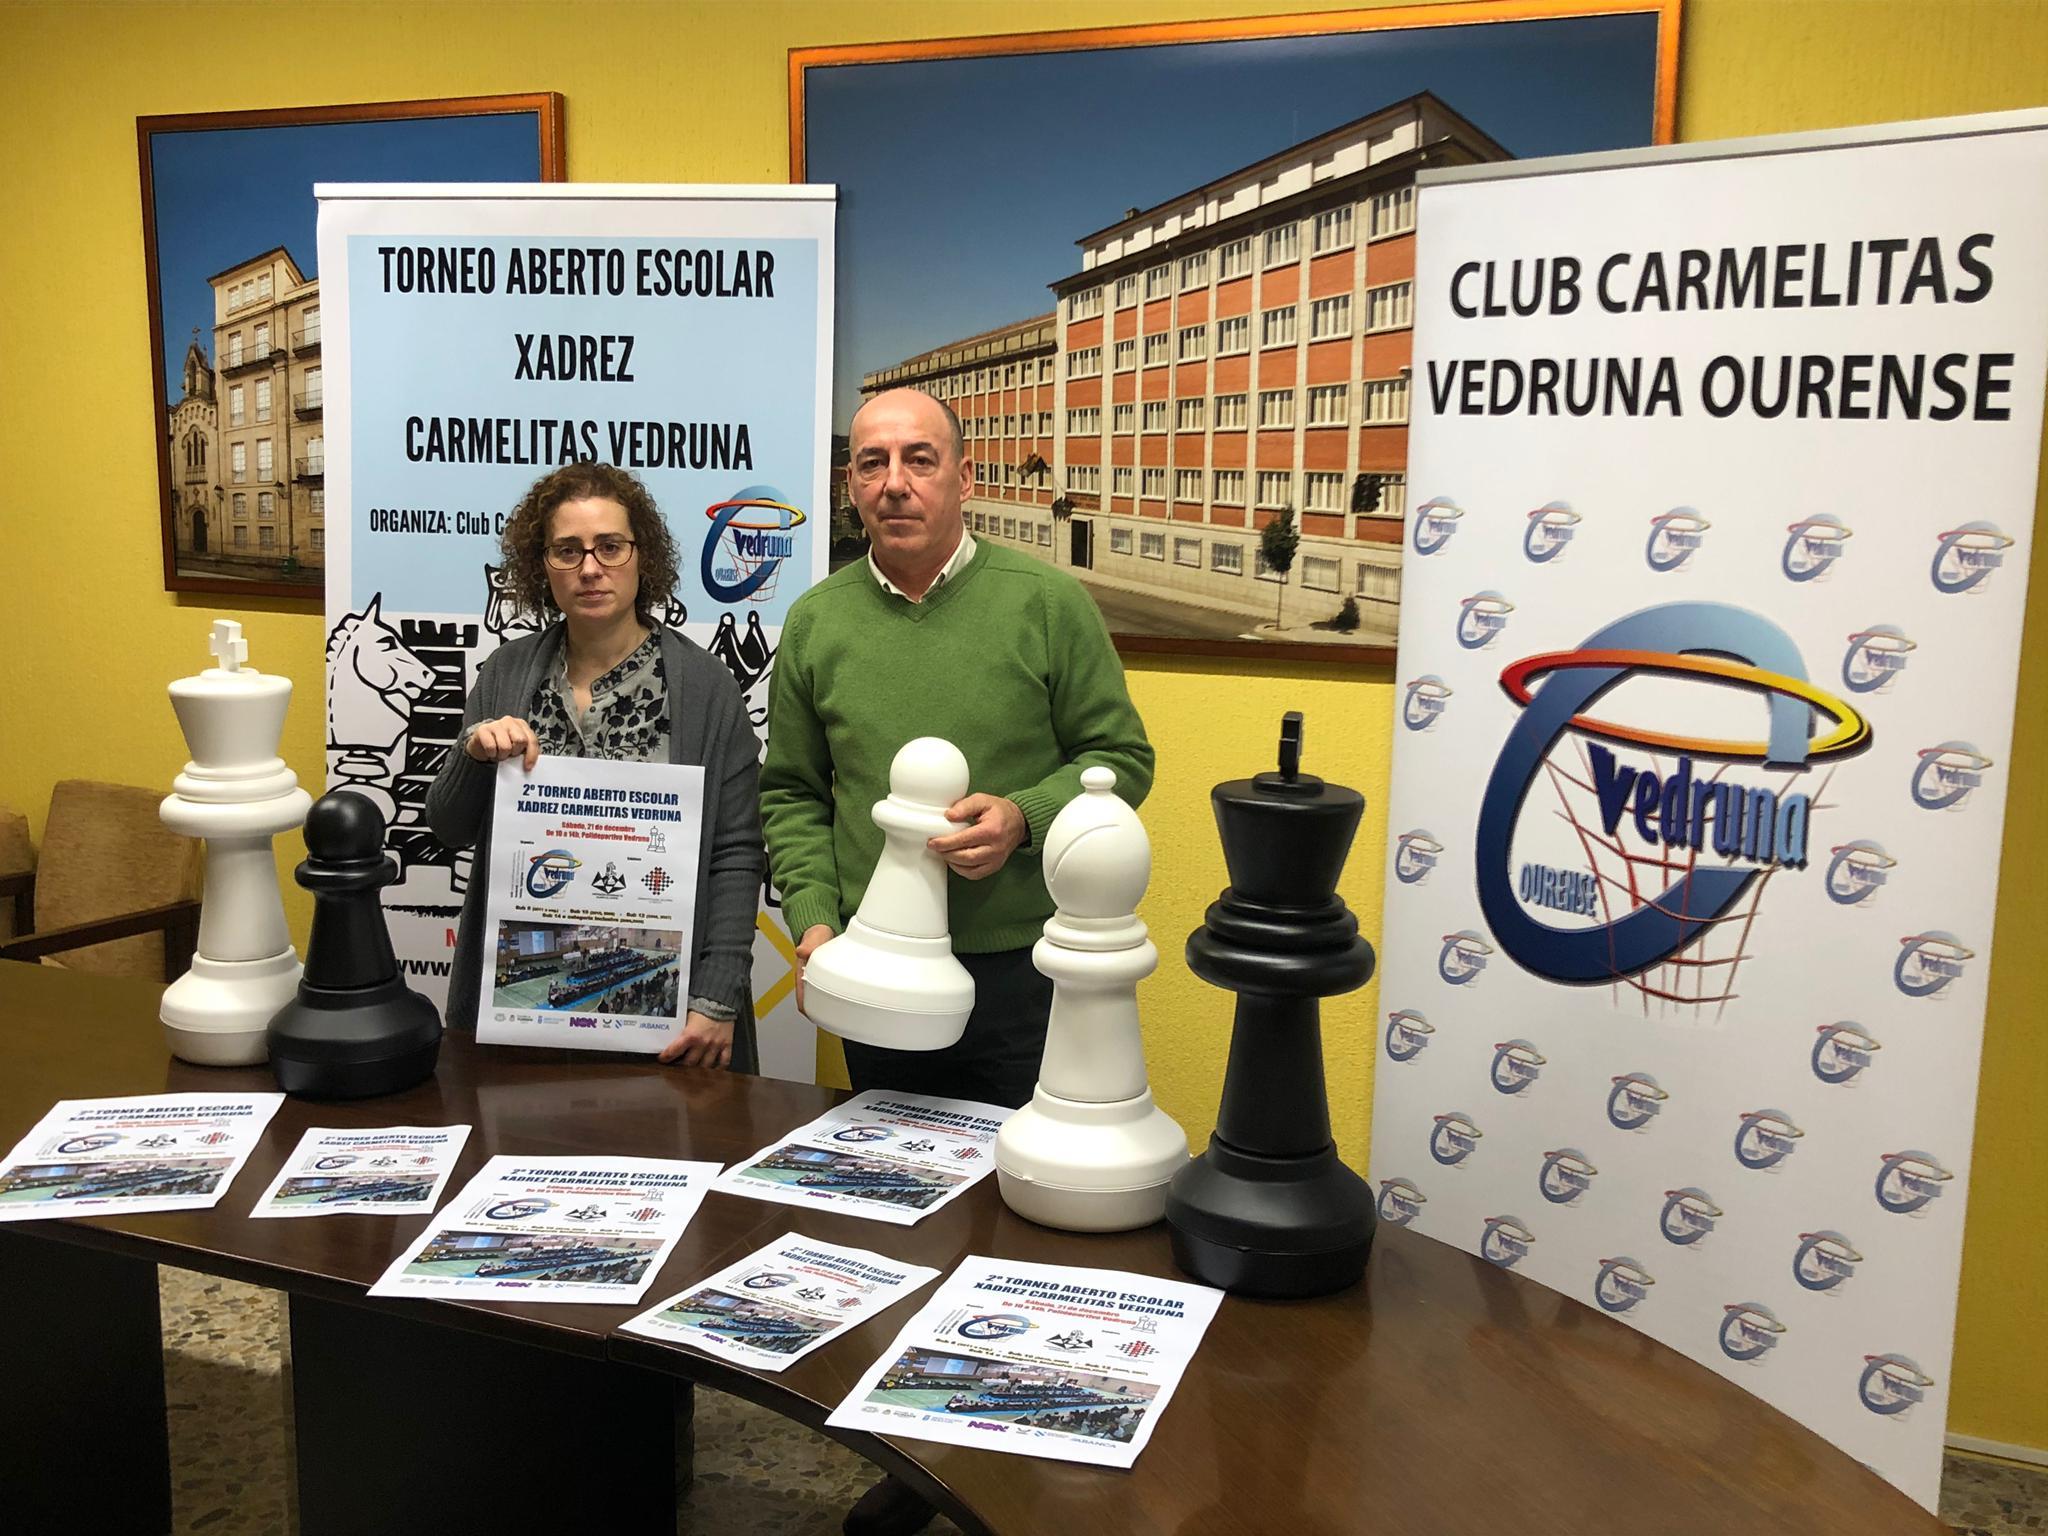 Presentación II Torneo Escolar Aberto de Xadrez Carmelitas Vedruna